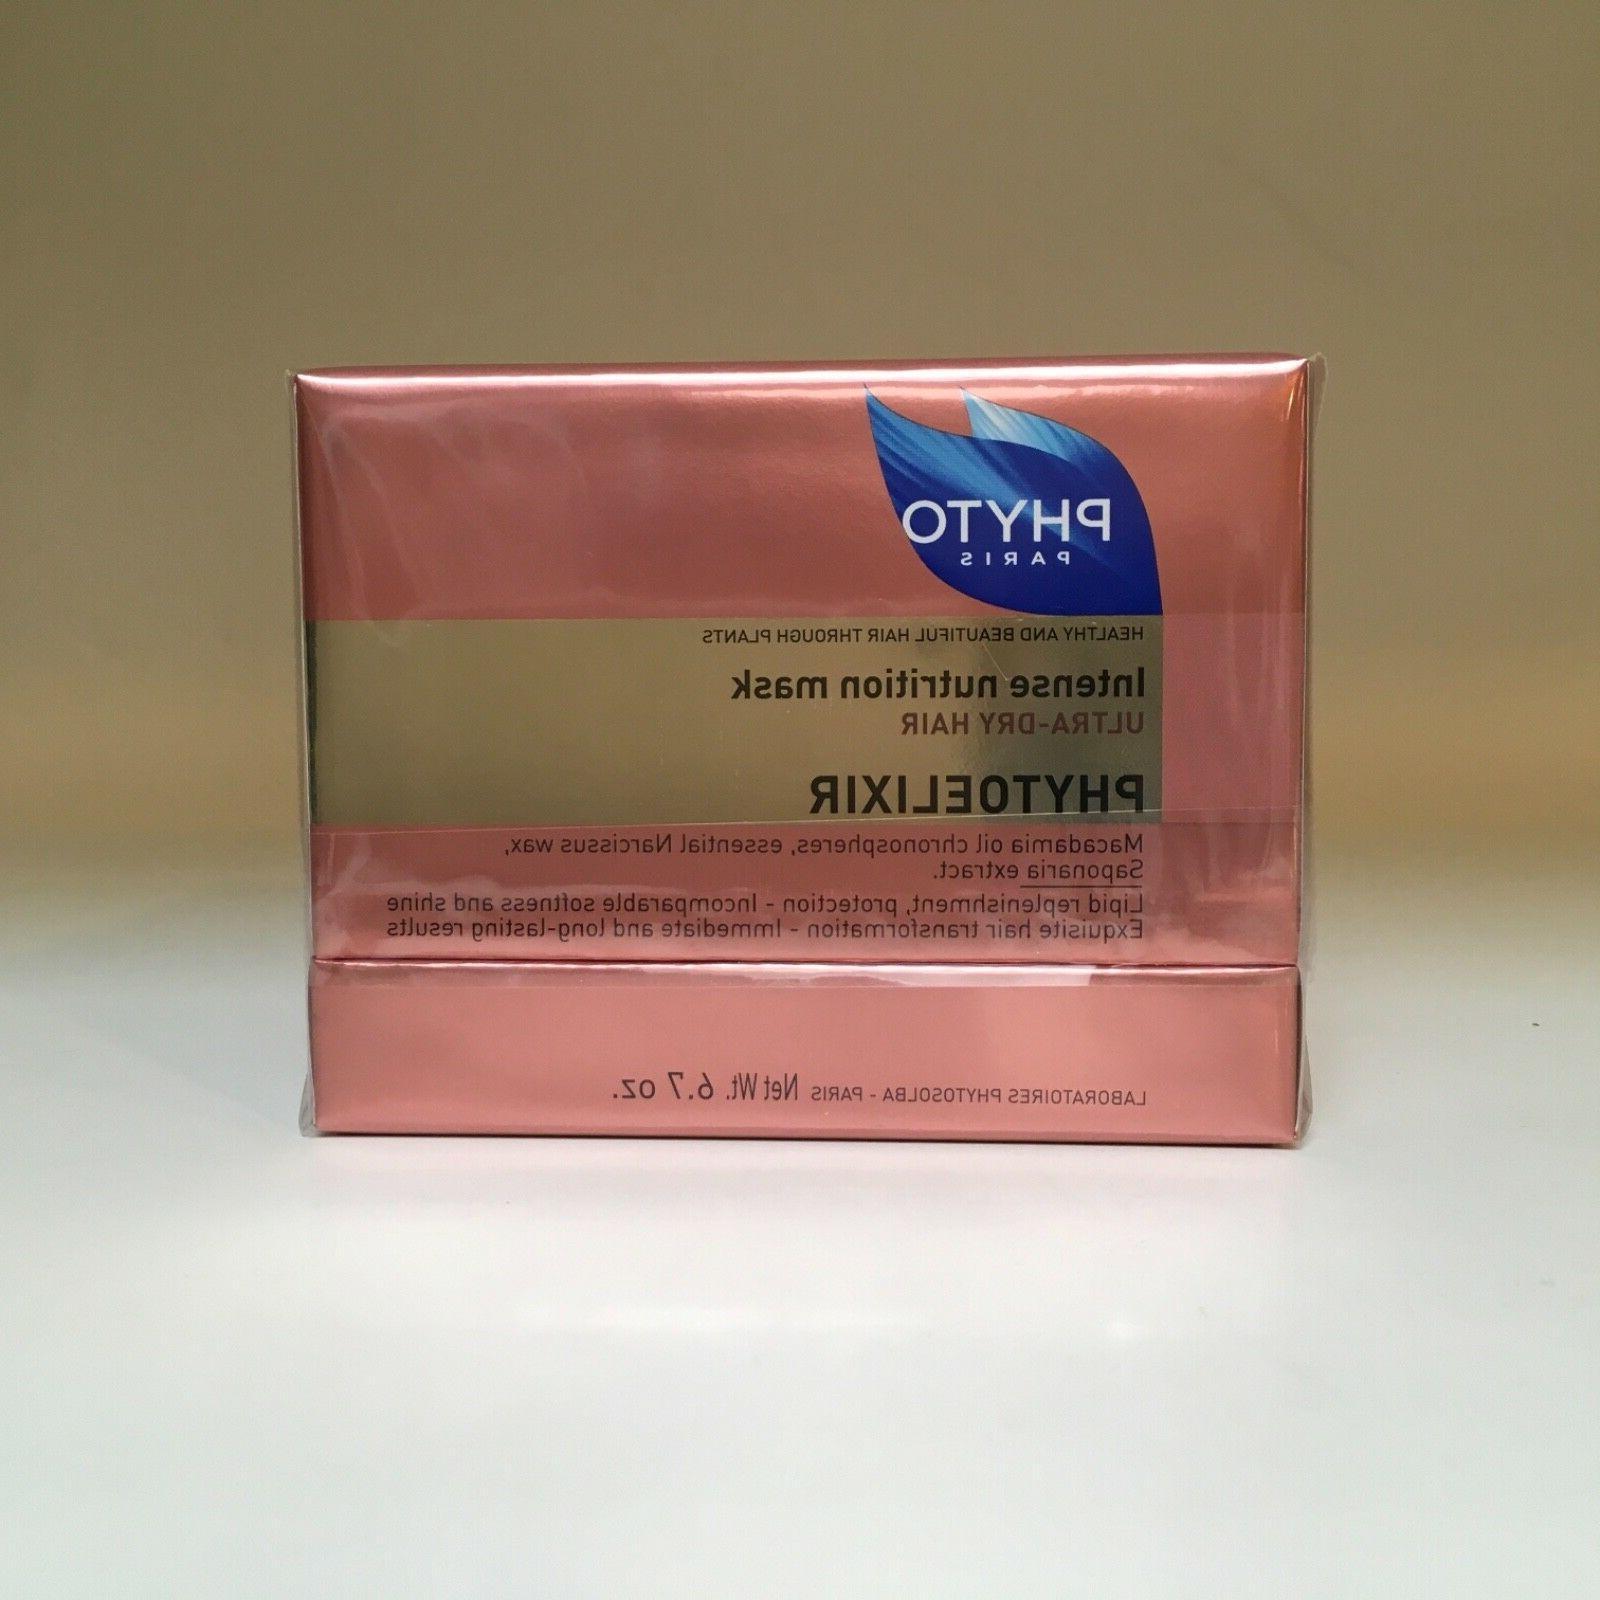 elixir intense nutrition mask 6 7oz 200